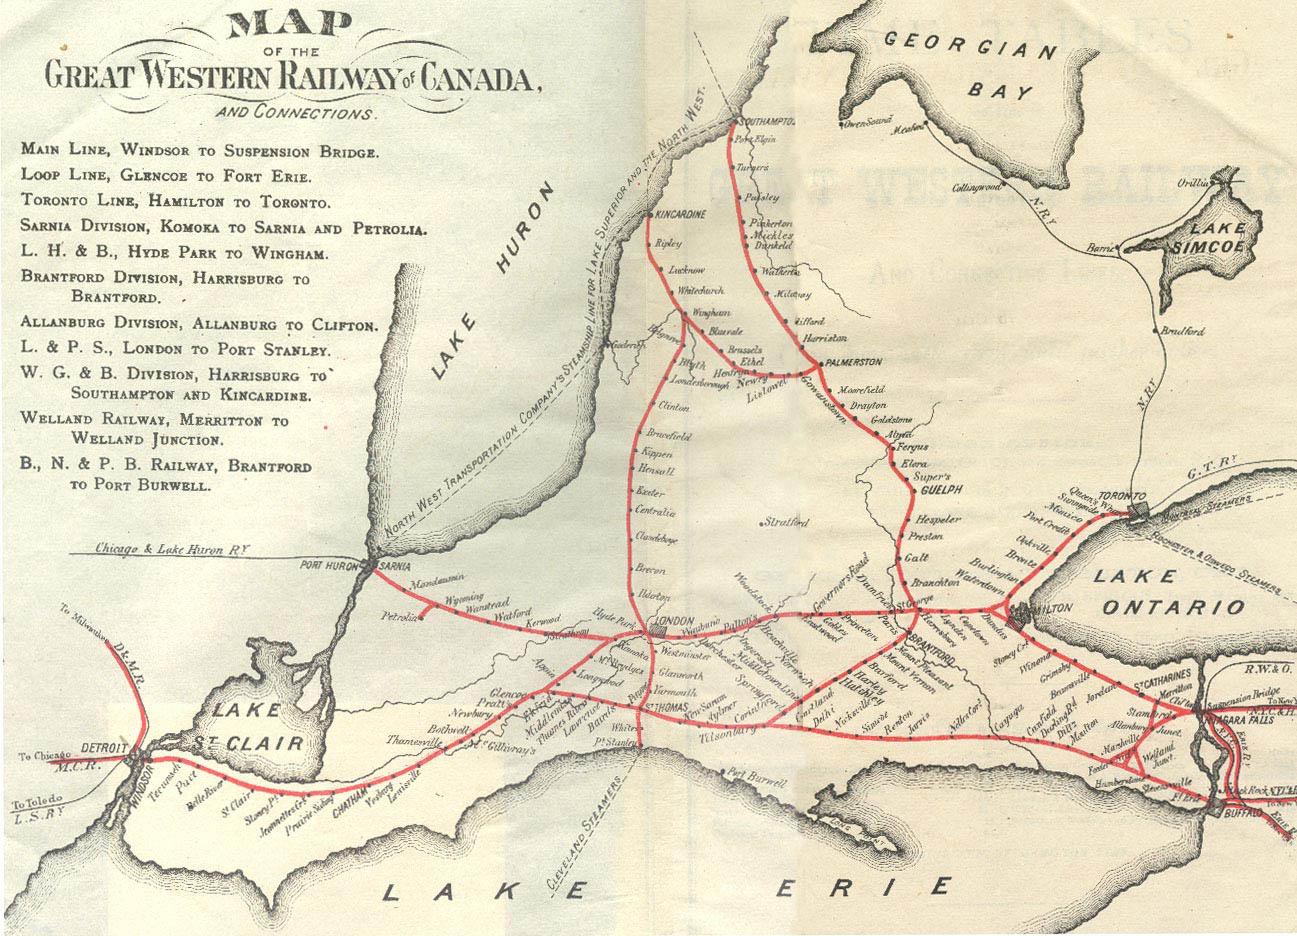 FileGreat Western Railway map 1879jpg Wikimedia Commons